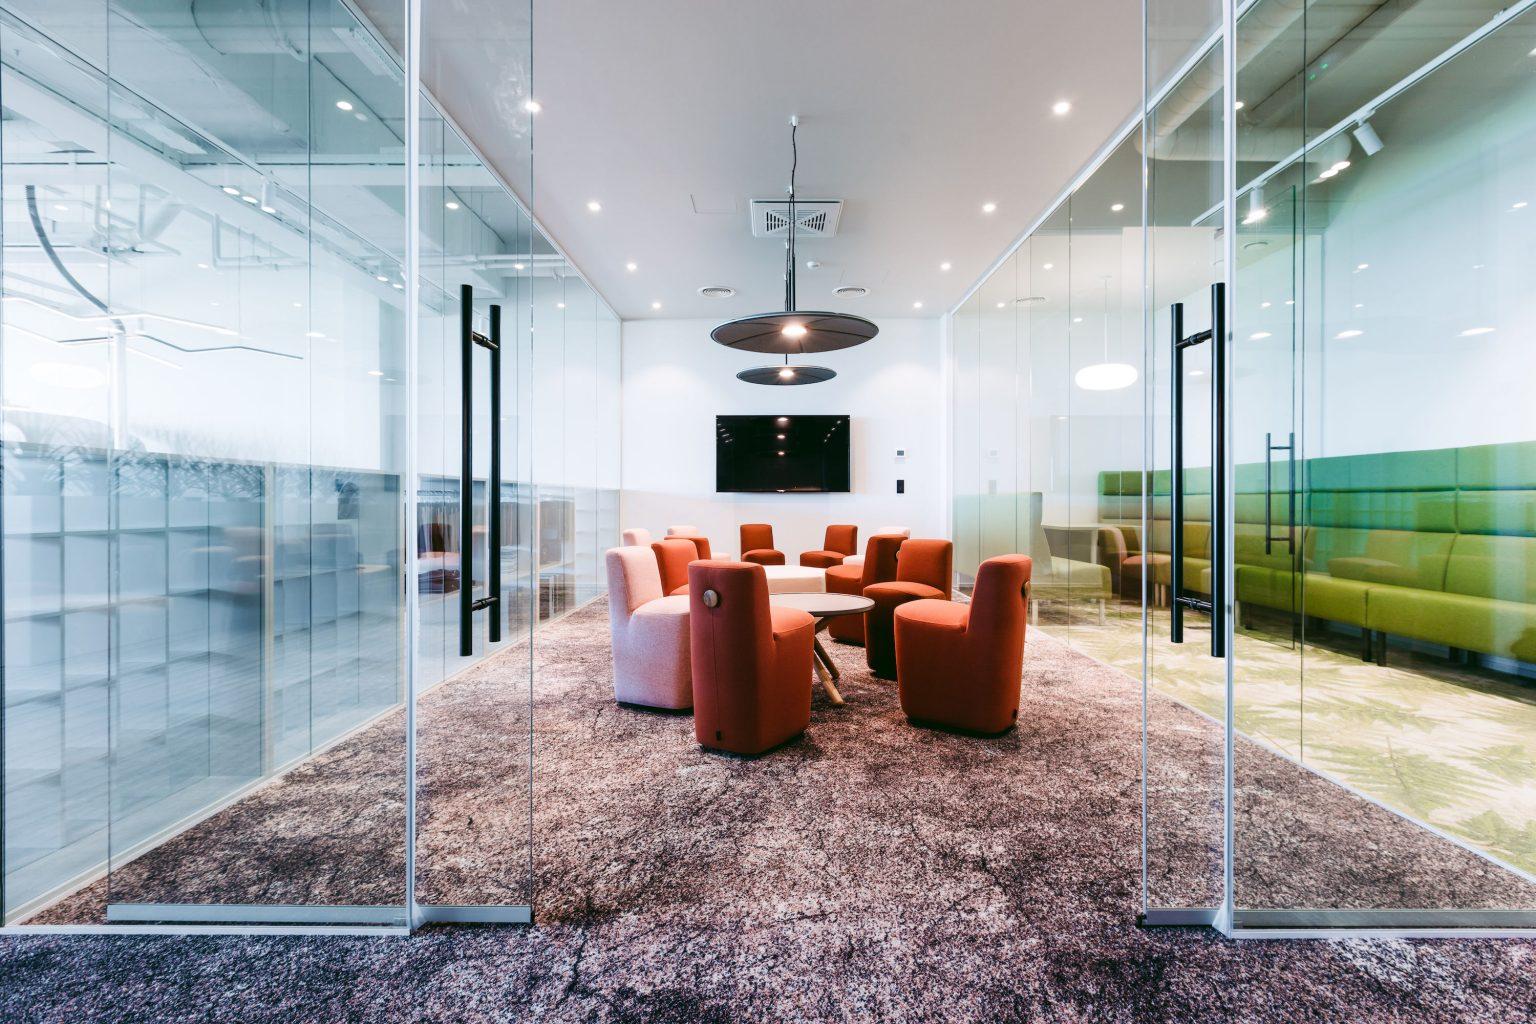 Biennale Interieur - Belgium's leading design and interior event - Softrend_office_byandresraudjalg_2-scaled-1.jpg